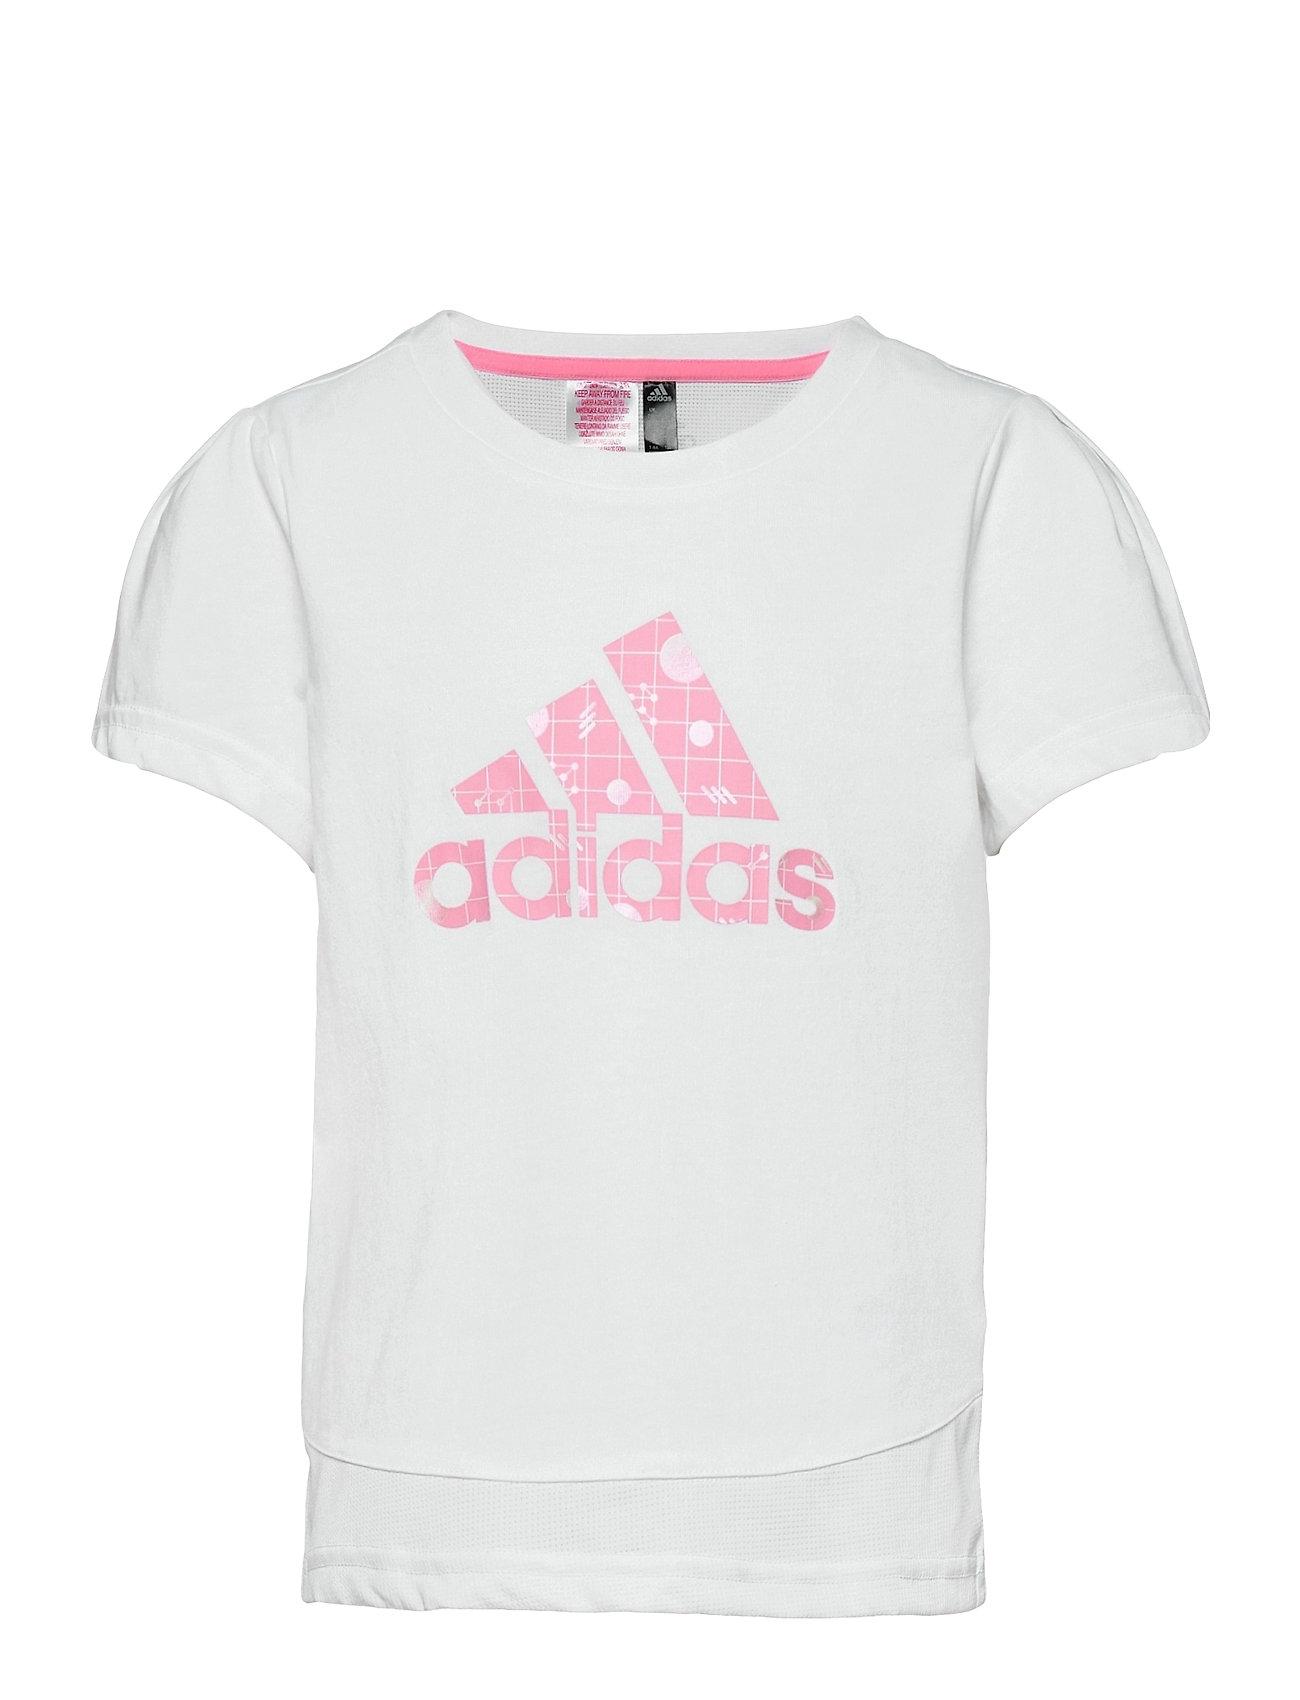 Image of Training Essentials Summer T-Shirt T-shirt Hvid Adidas Performance (3499897361)